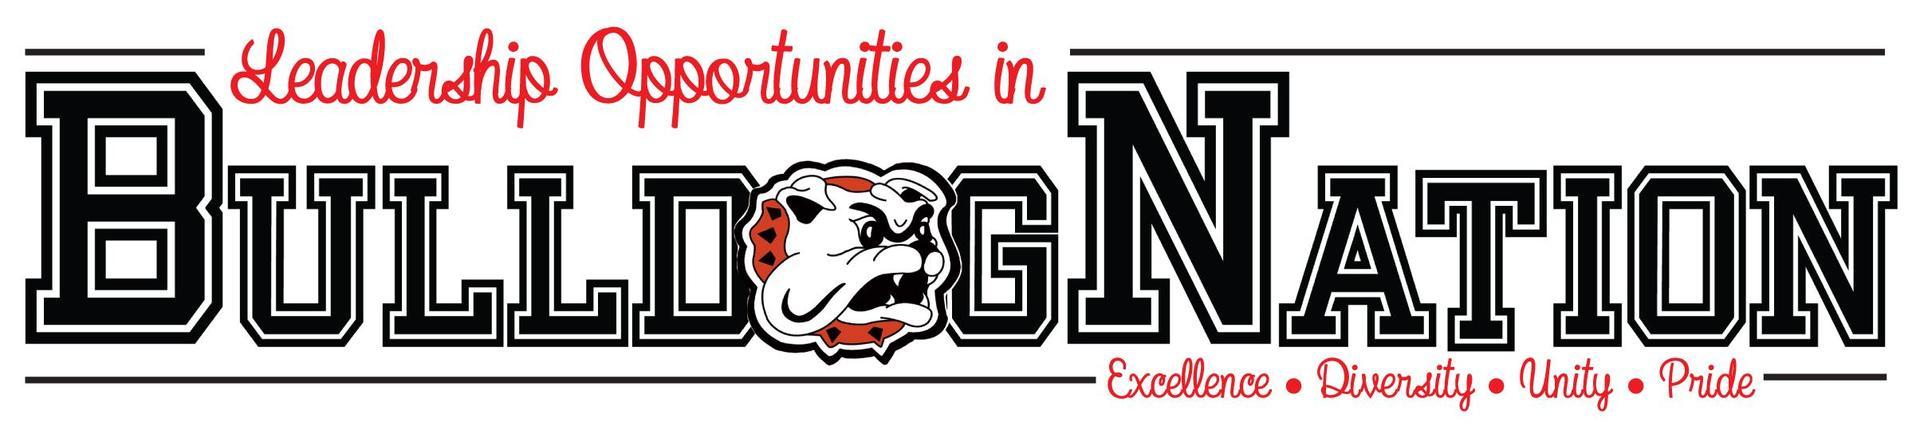 Leadership Opportunities Header